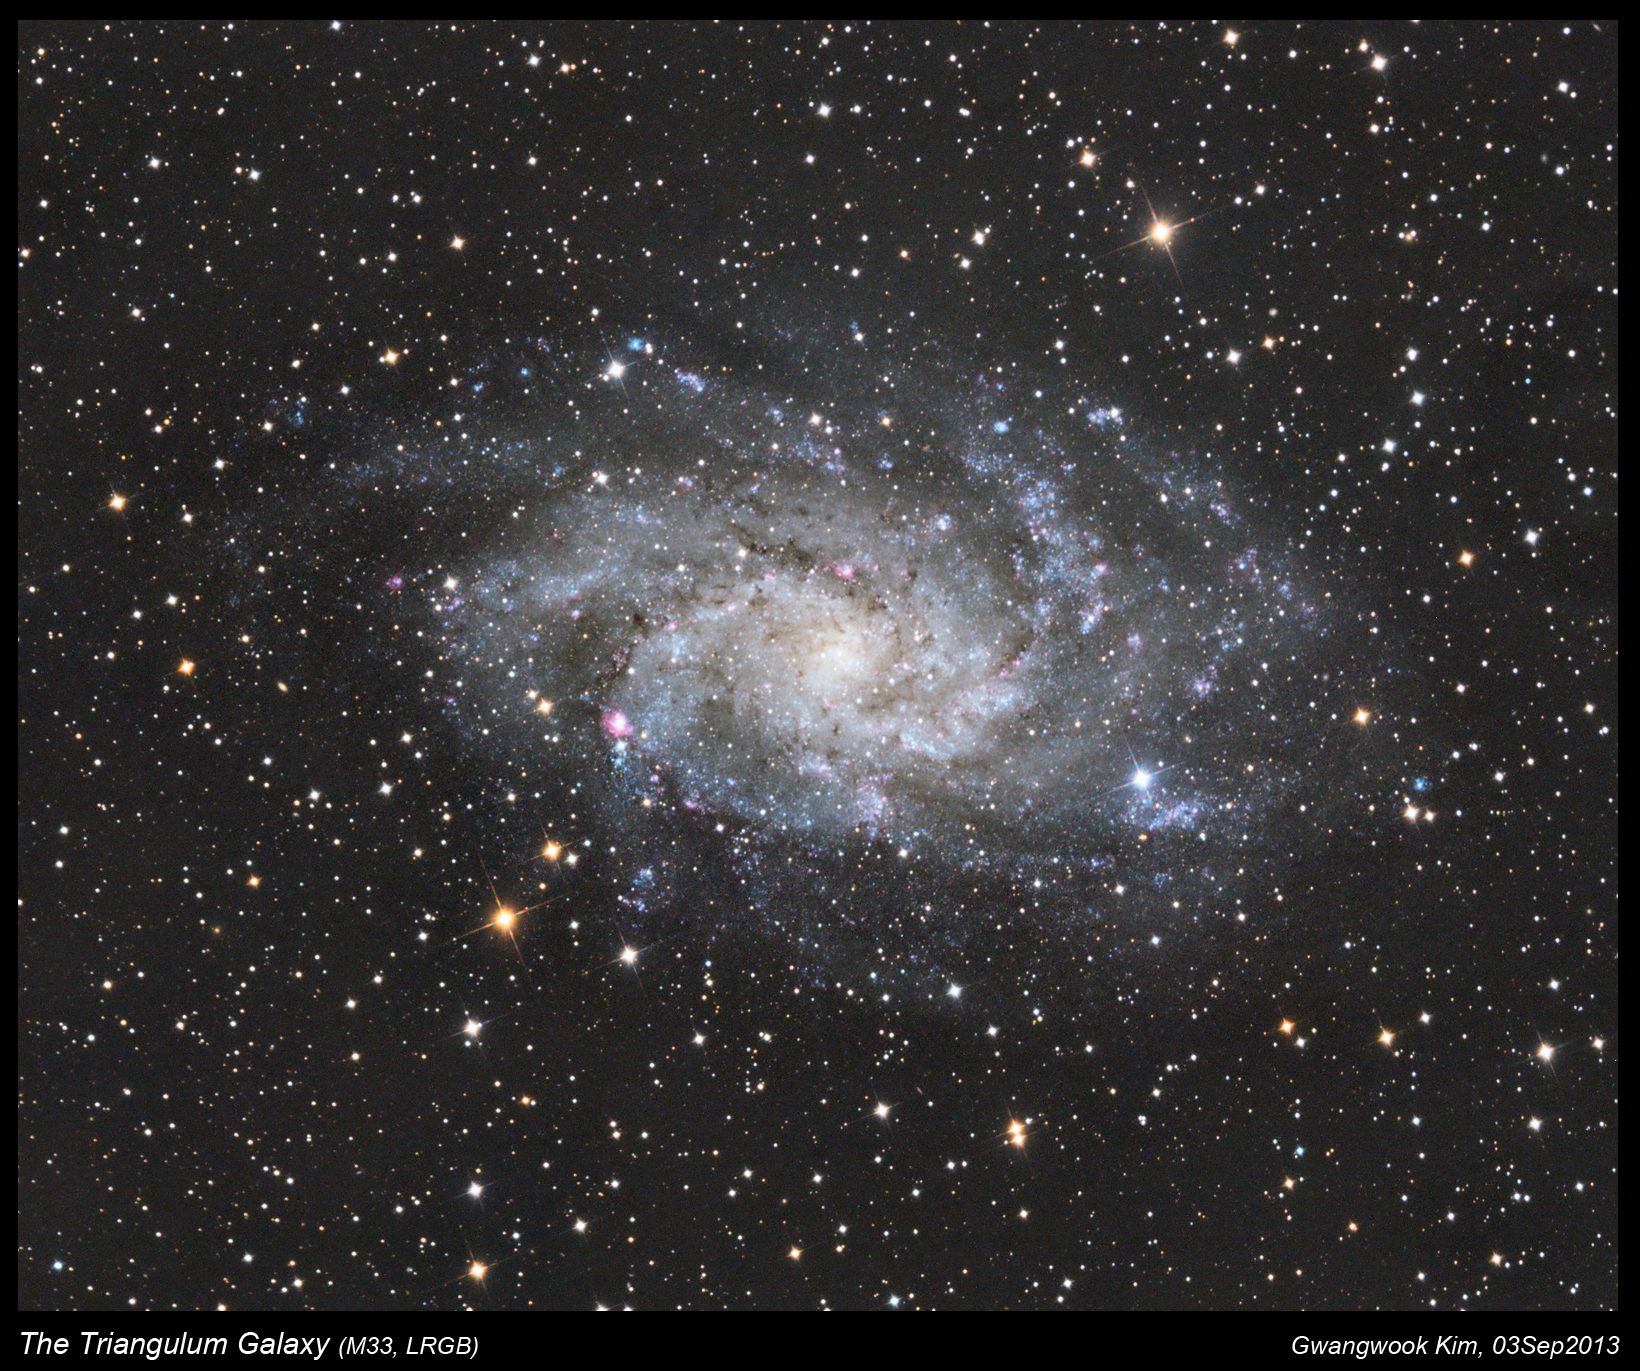 M33_LRGB_GWKIM_03Sep2013_s.jpg